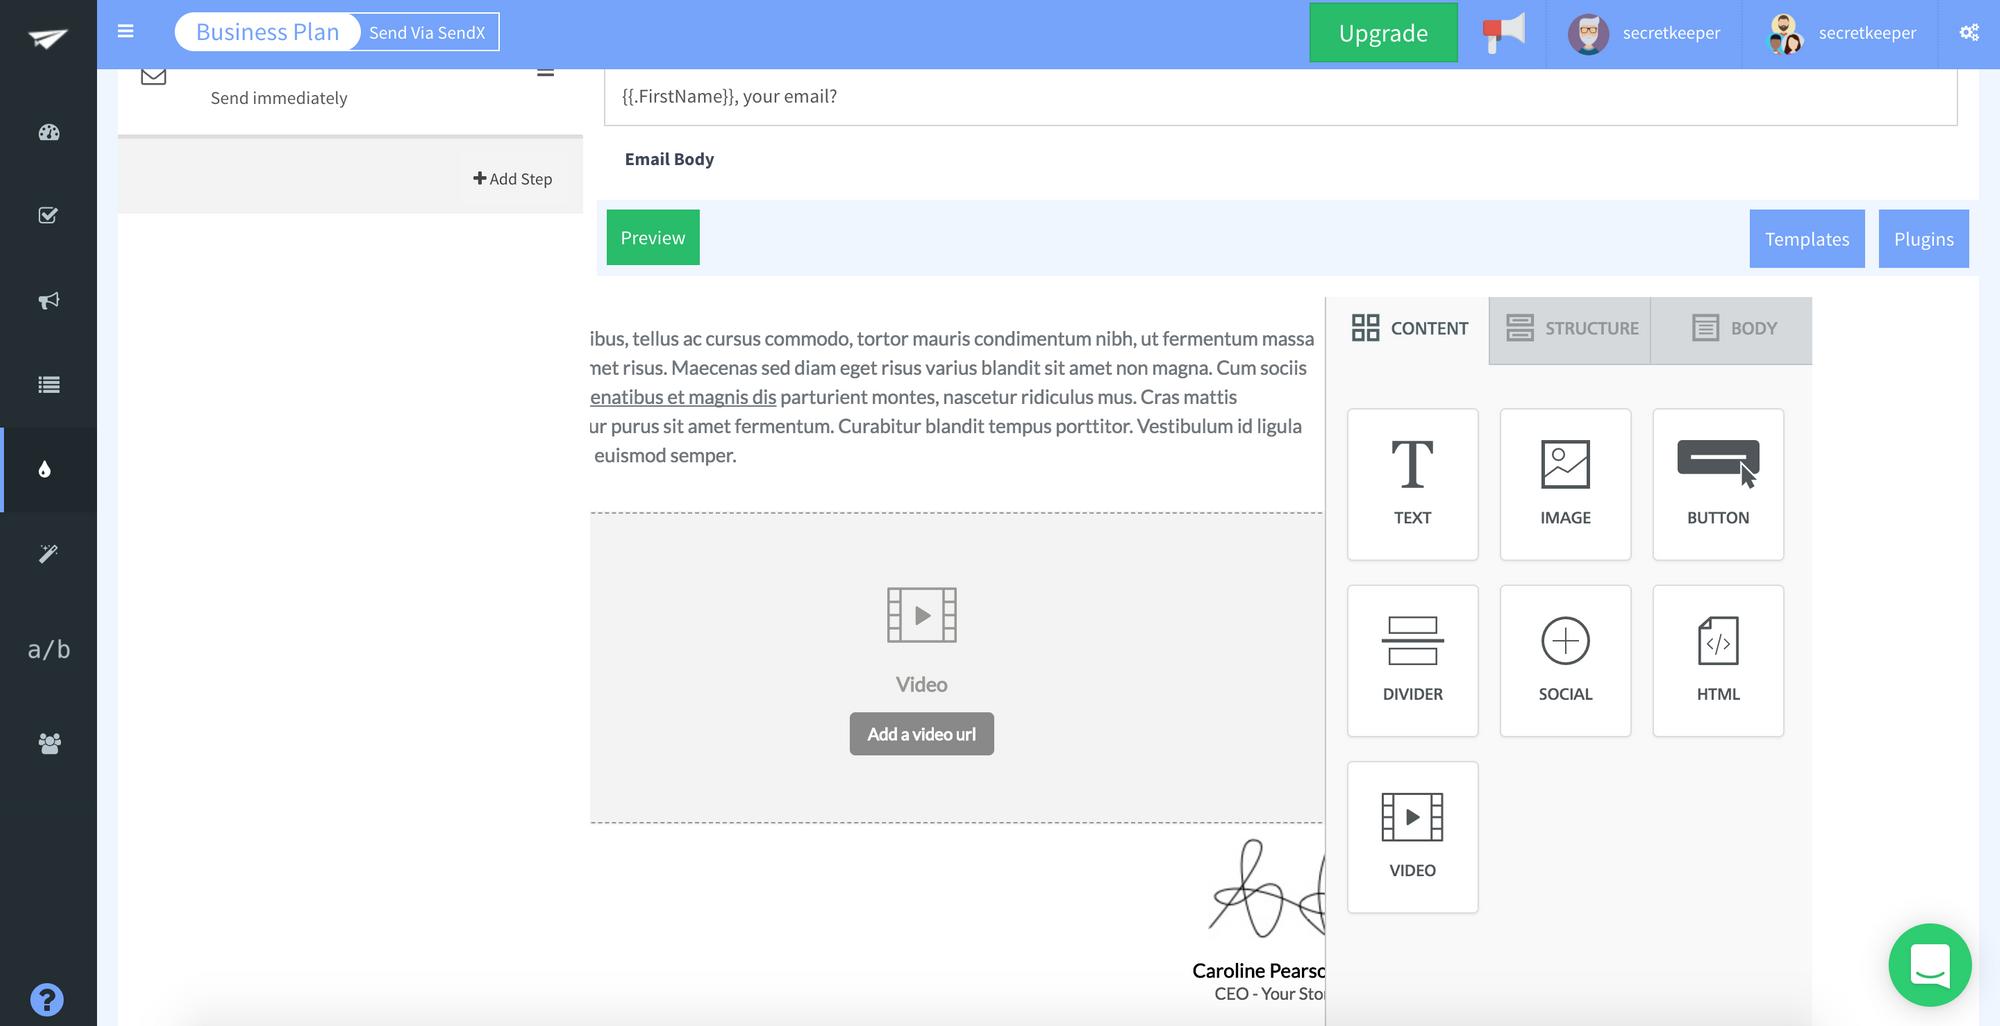 SendX embedding a video inside a drip email